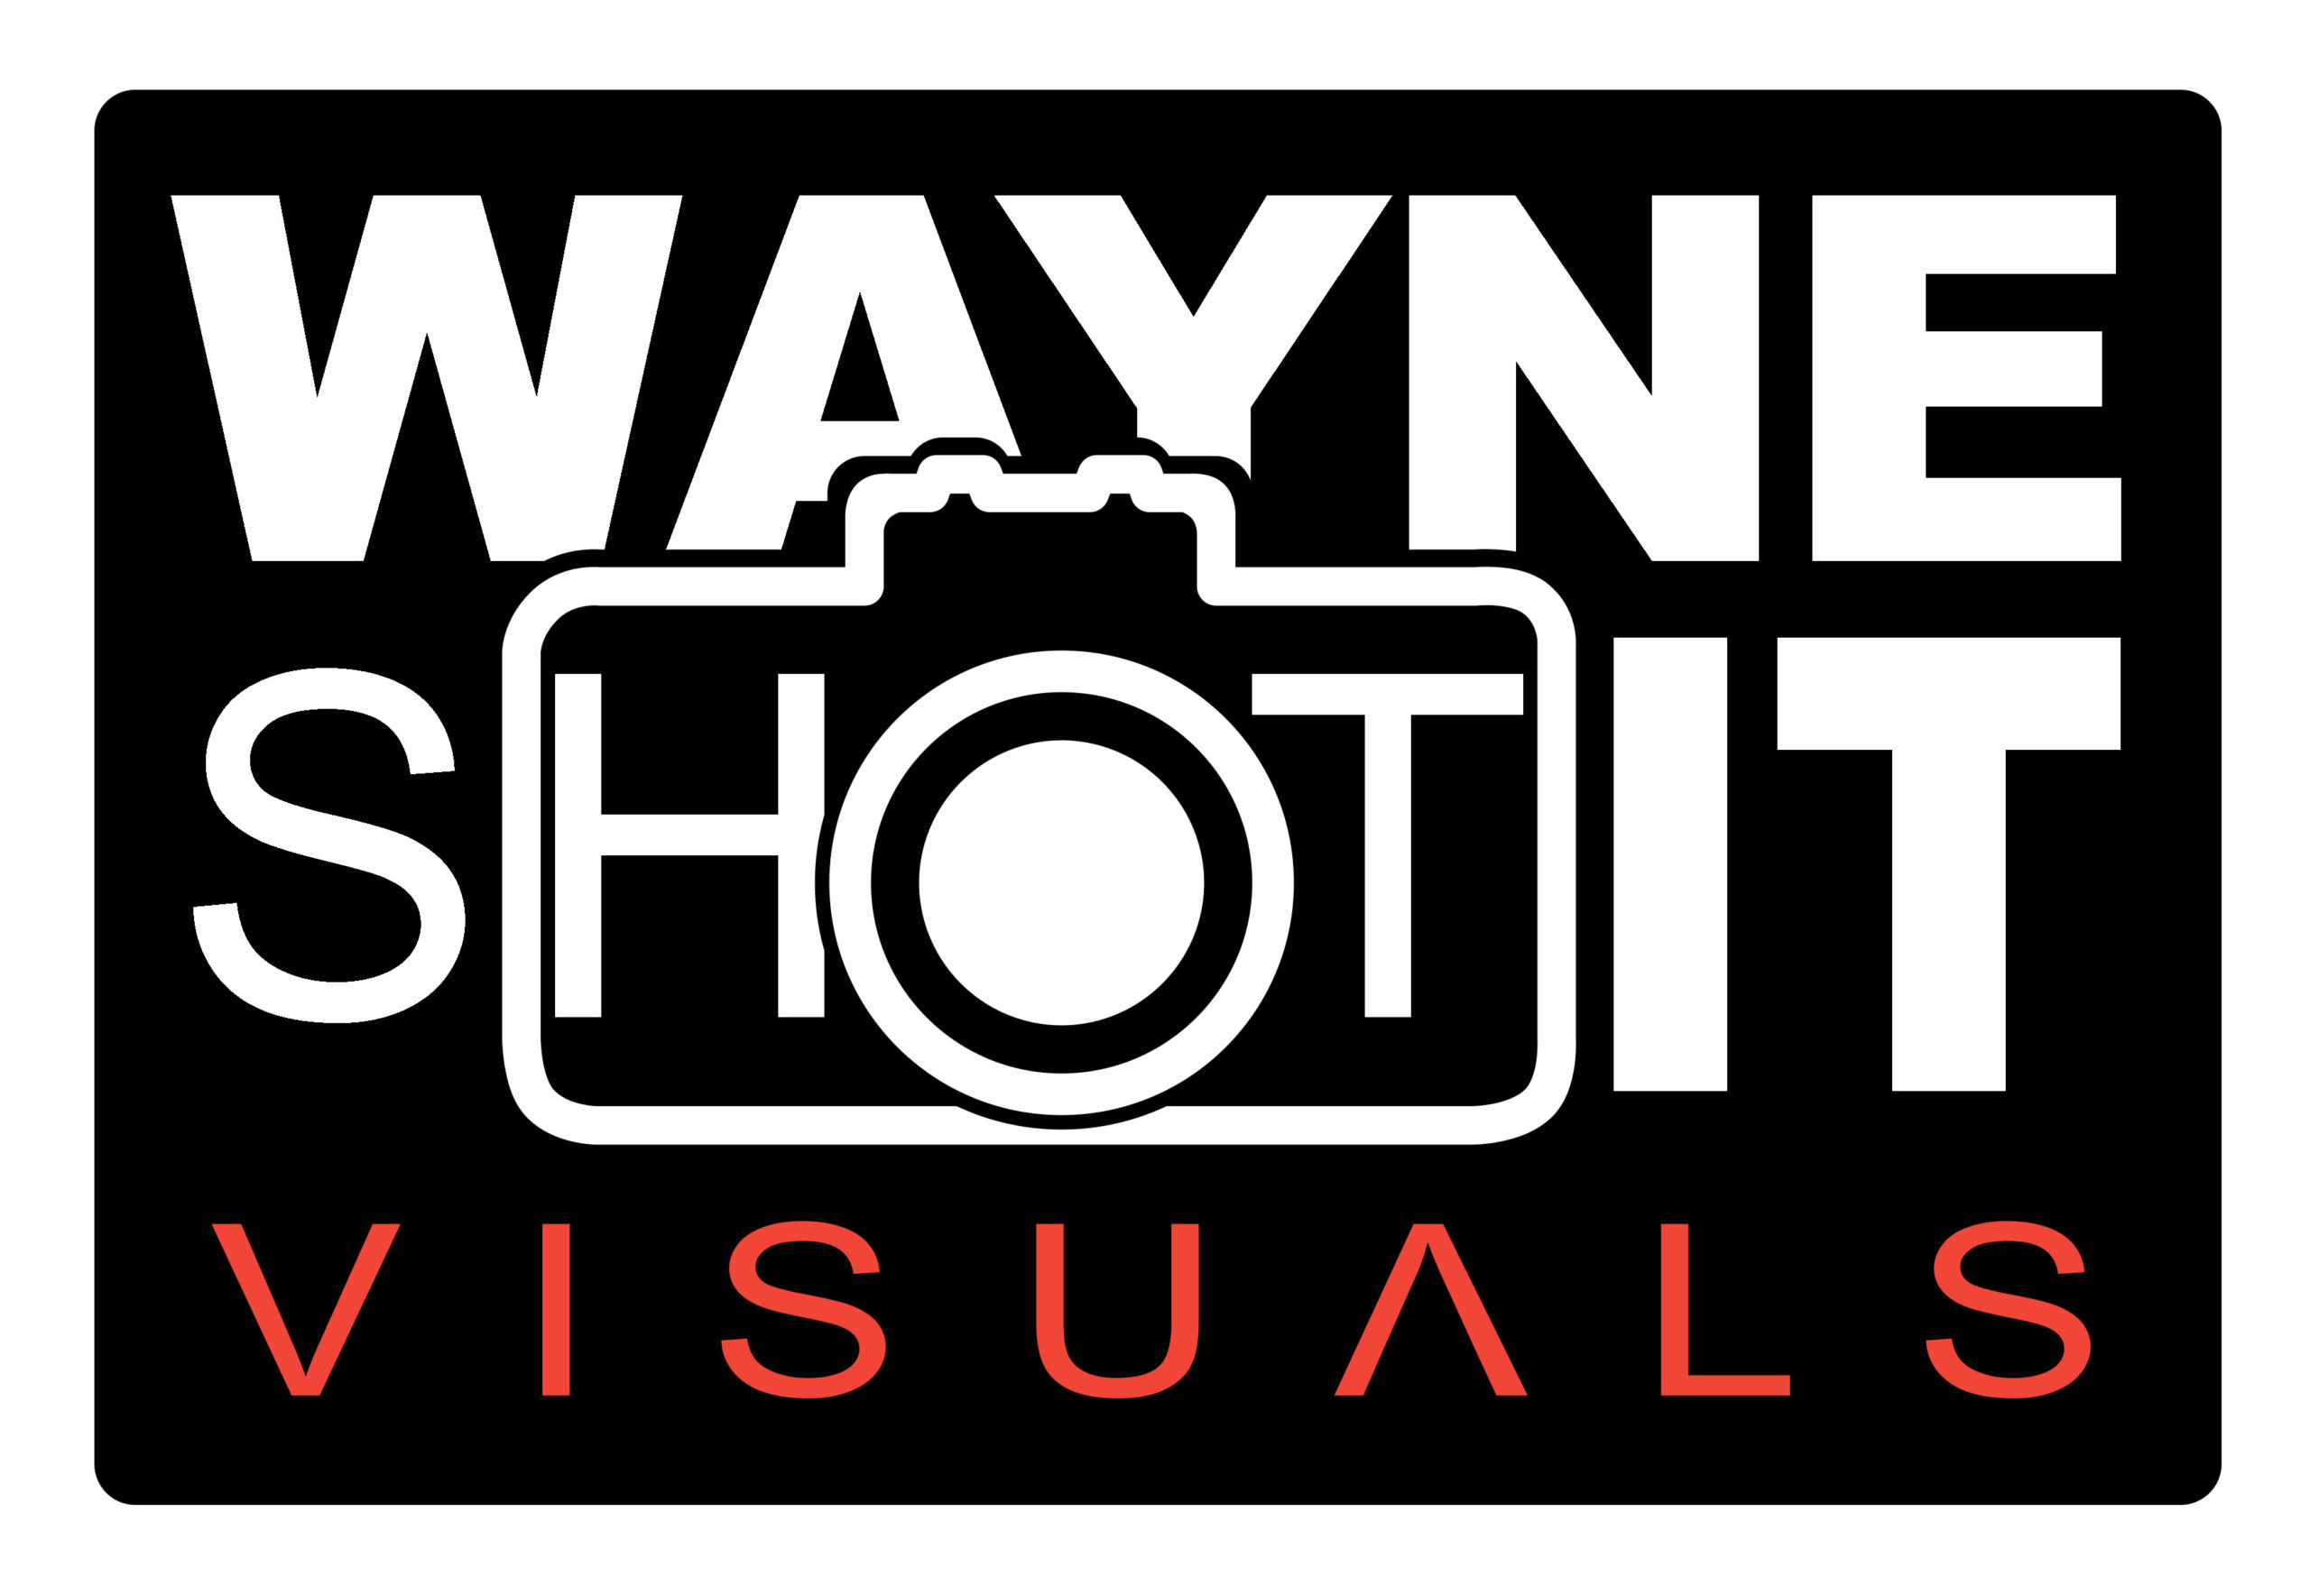 Wayne Shot It